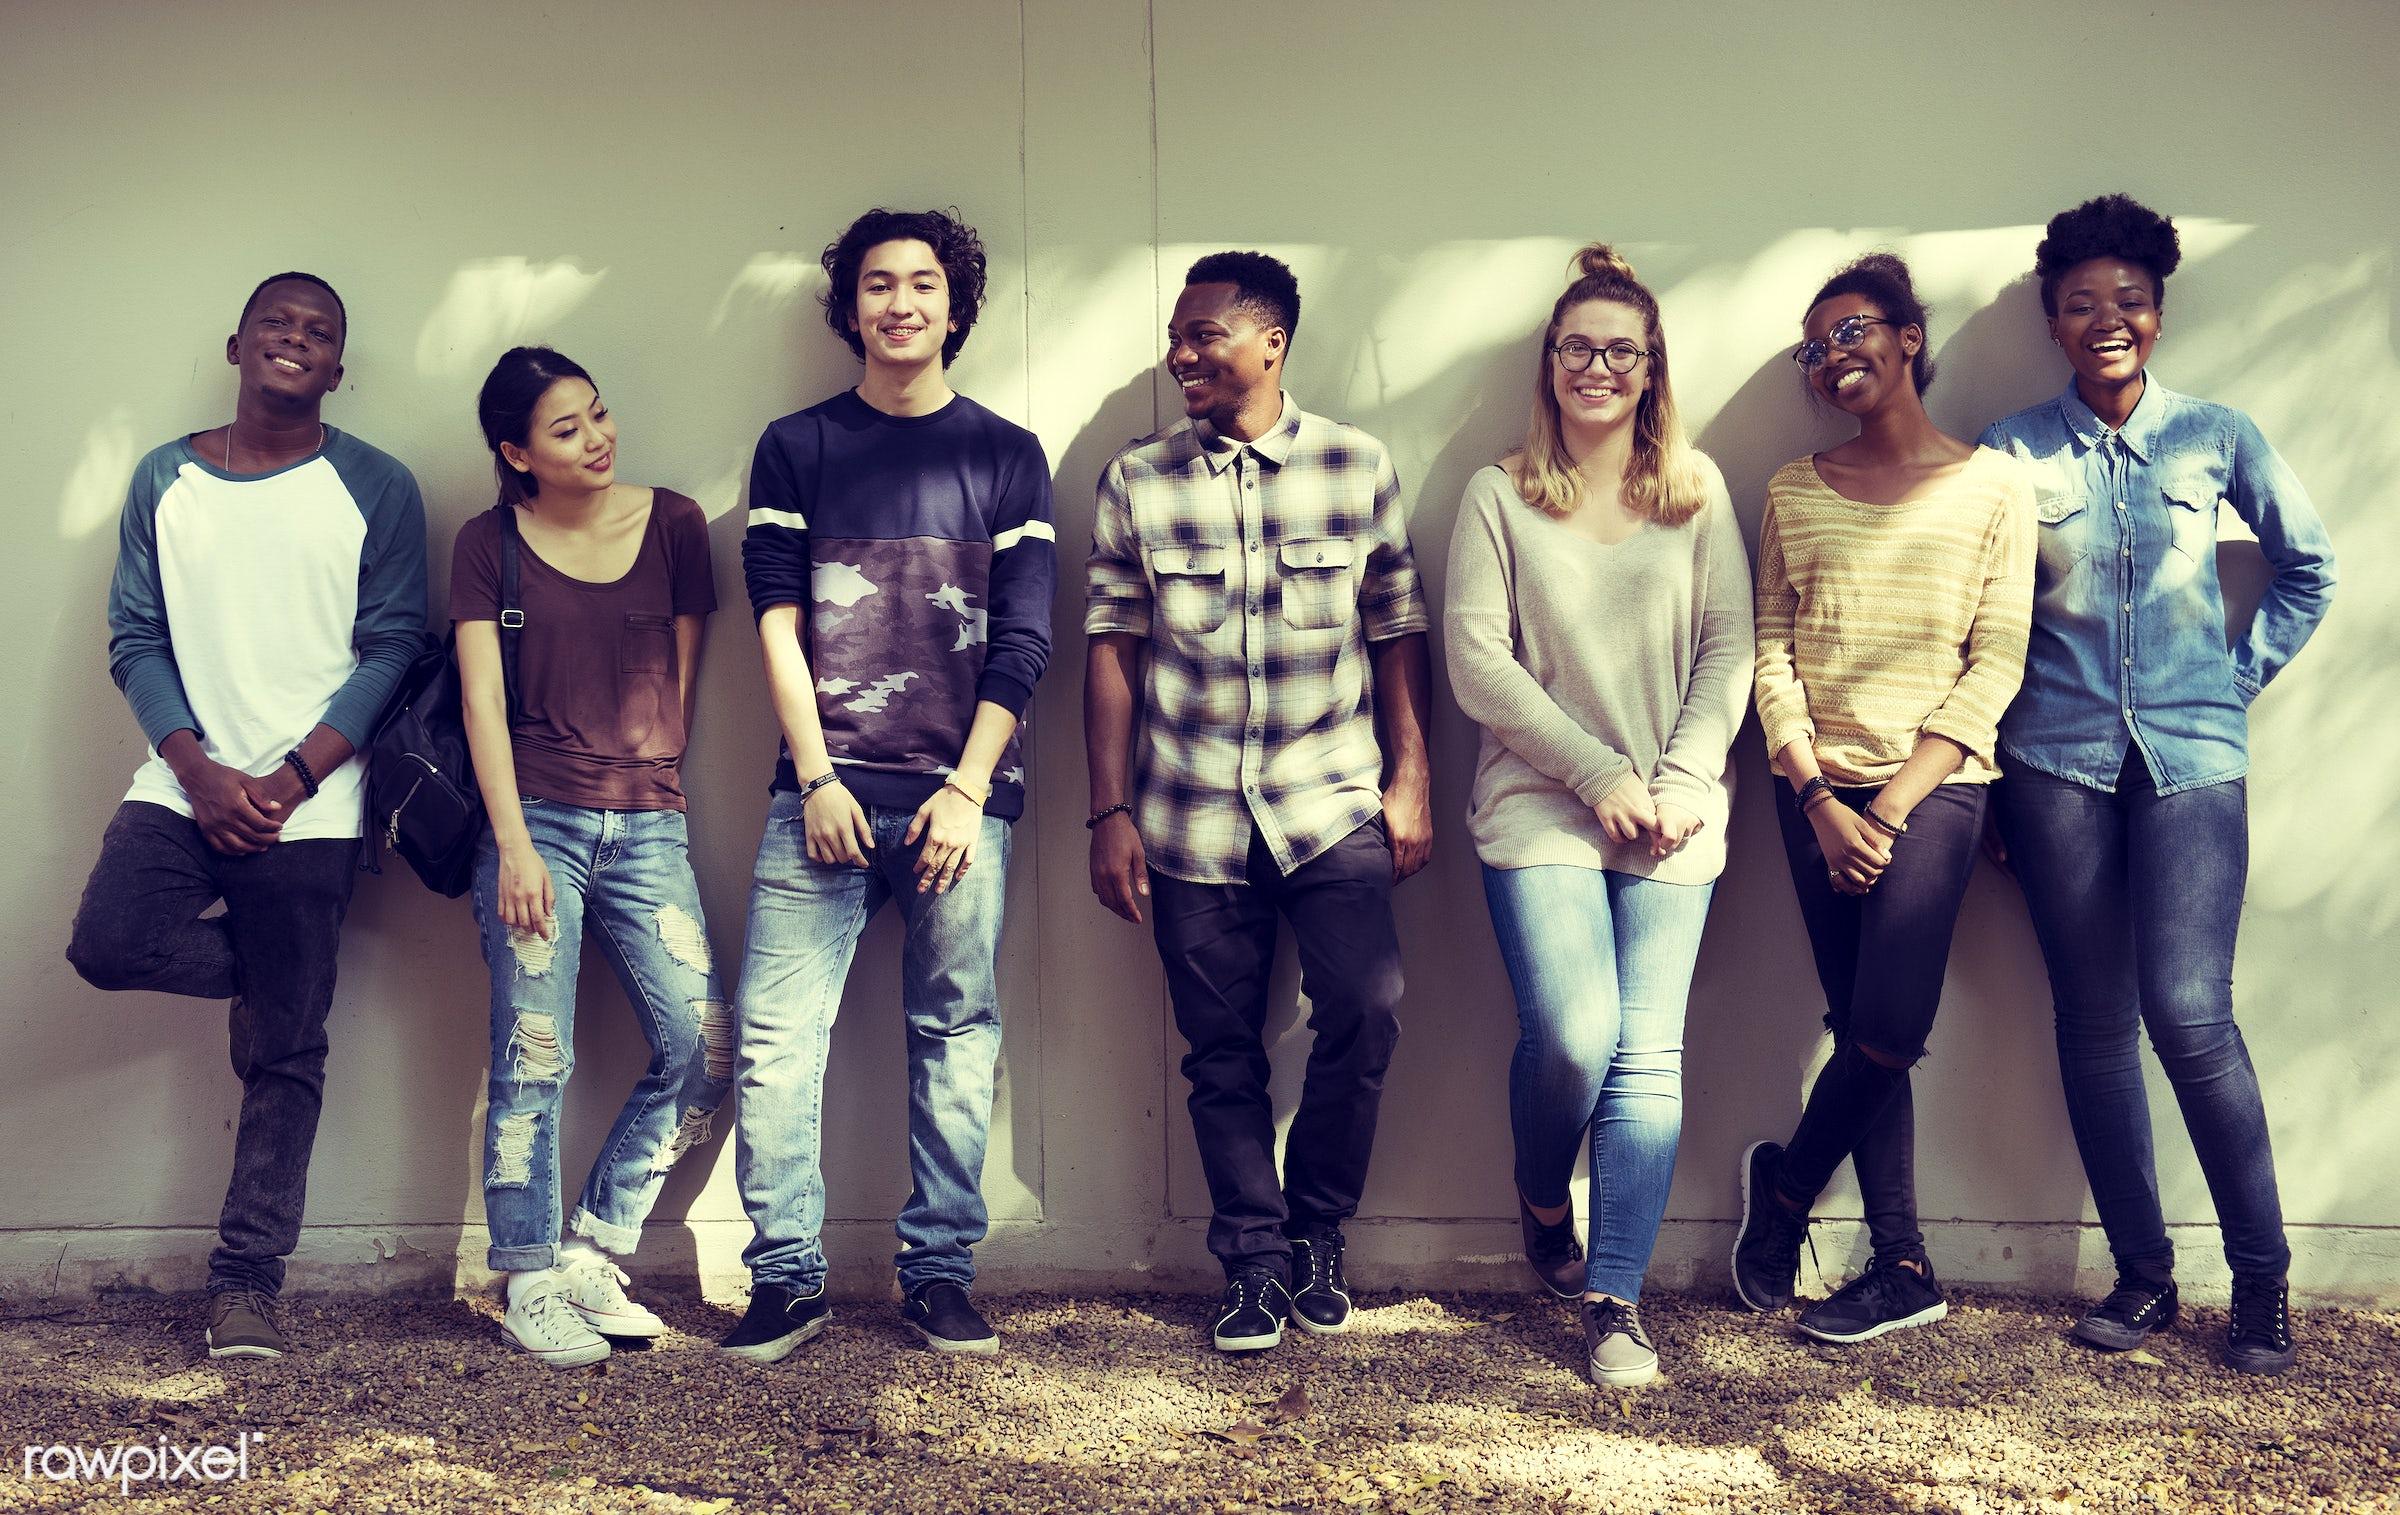 diverse, wisdom, people, teamwork, friends, sharing, student, casual, friendship, men, hipster, university, diversity,...